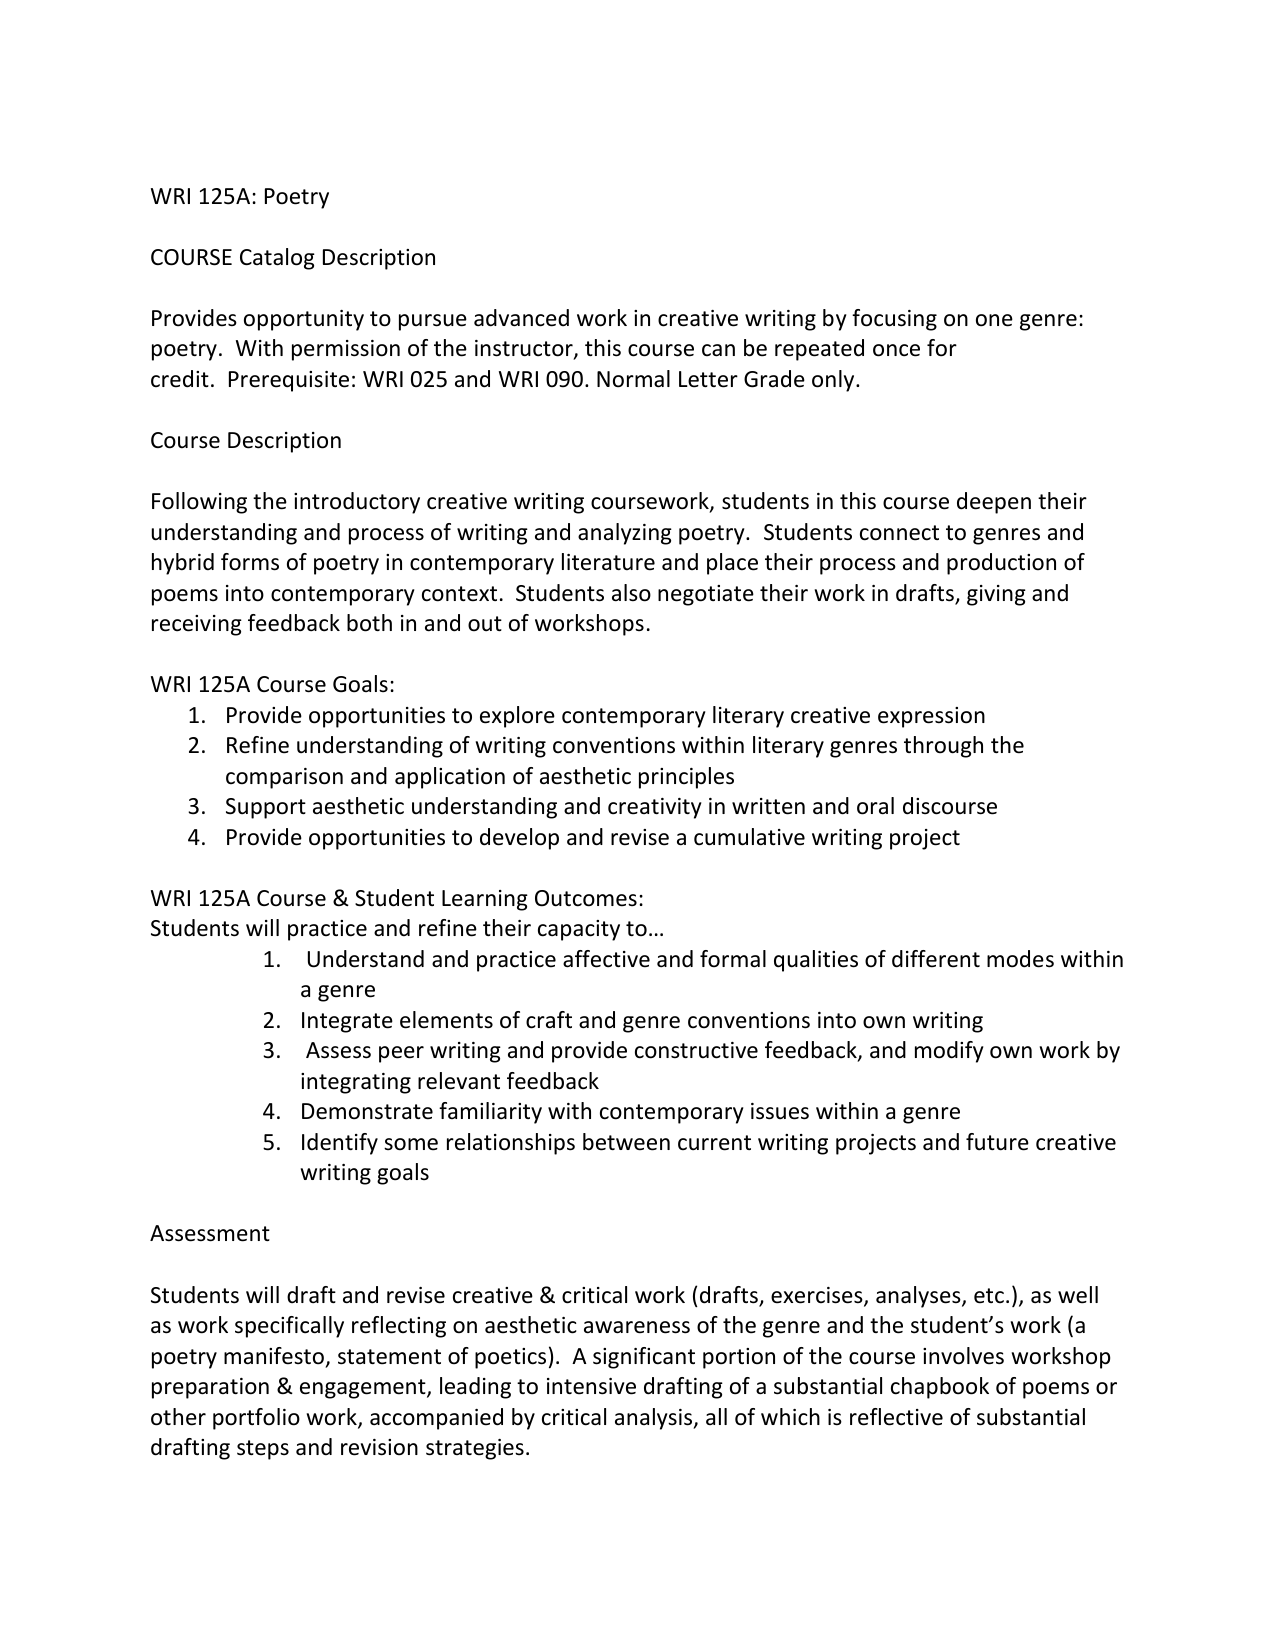 Presentation backgrounds professional computer services